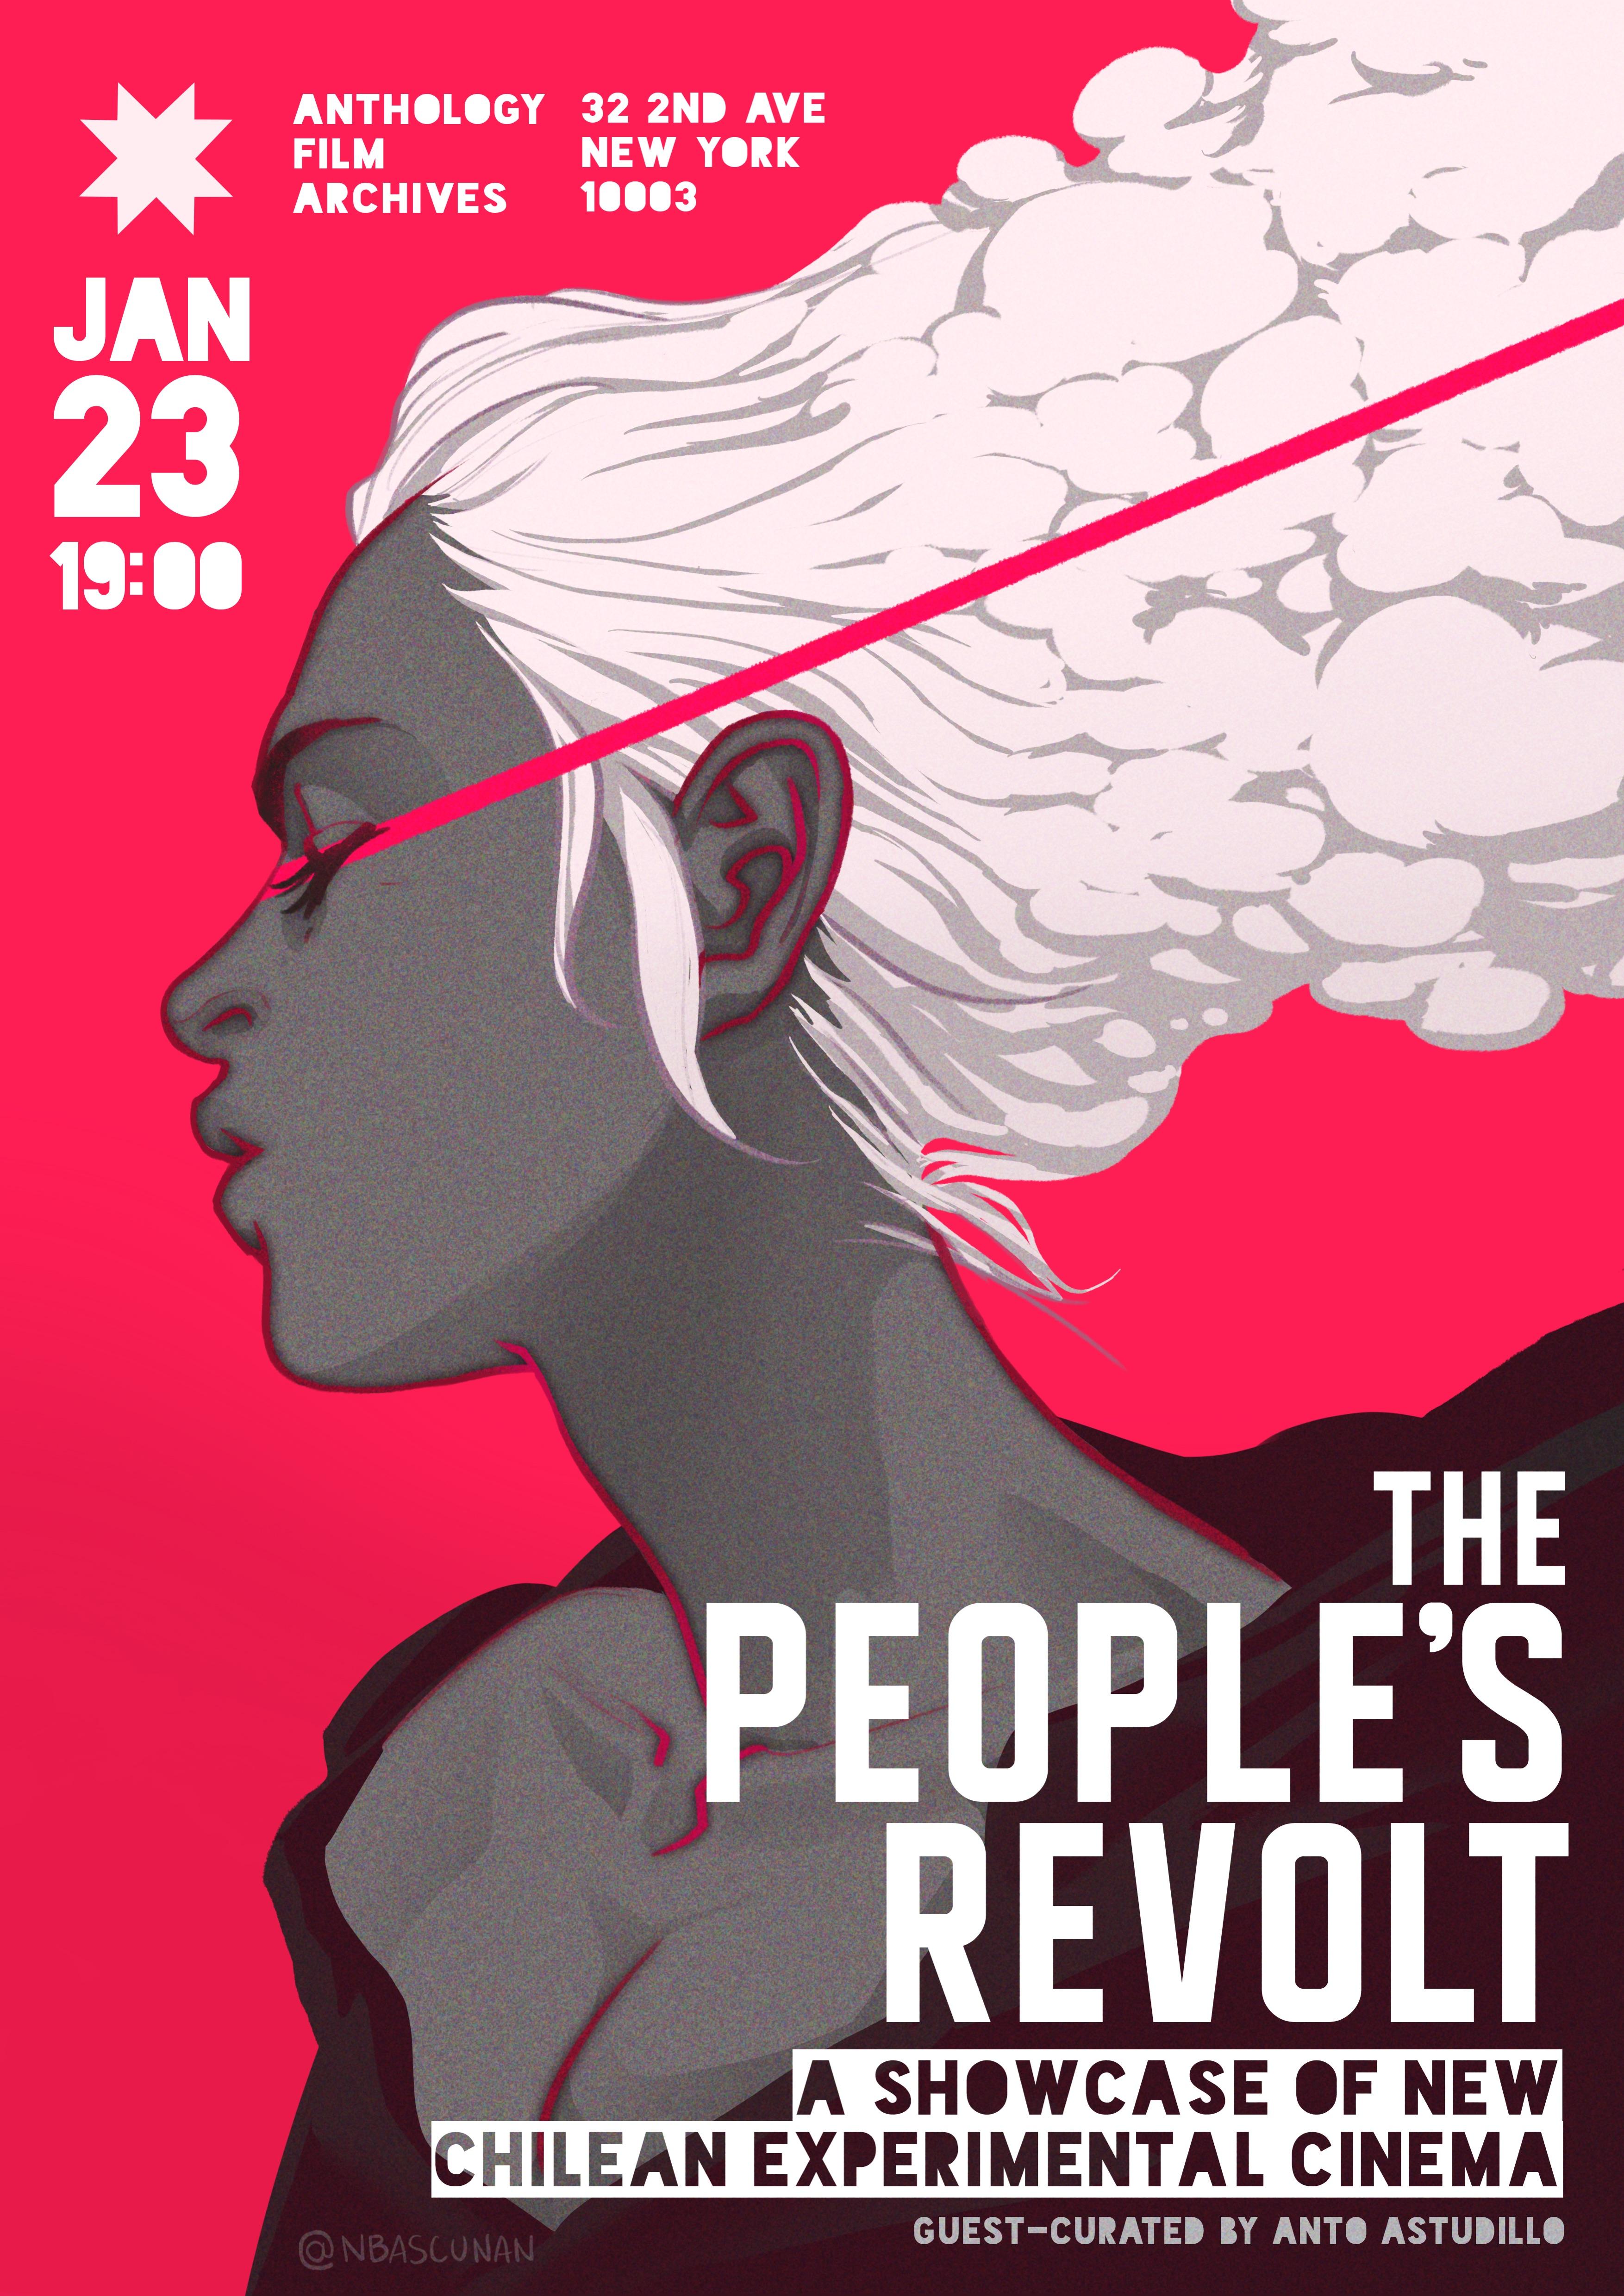 The_People's_Revolt-en comic lr.jpg